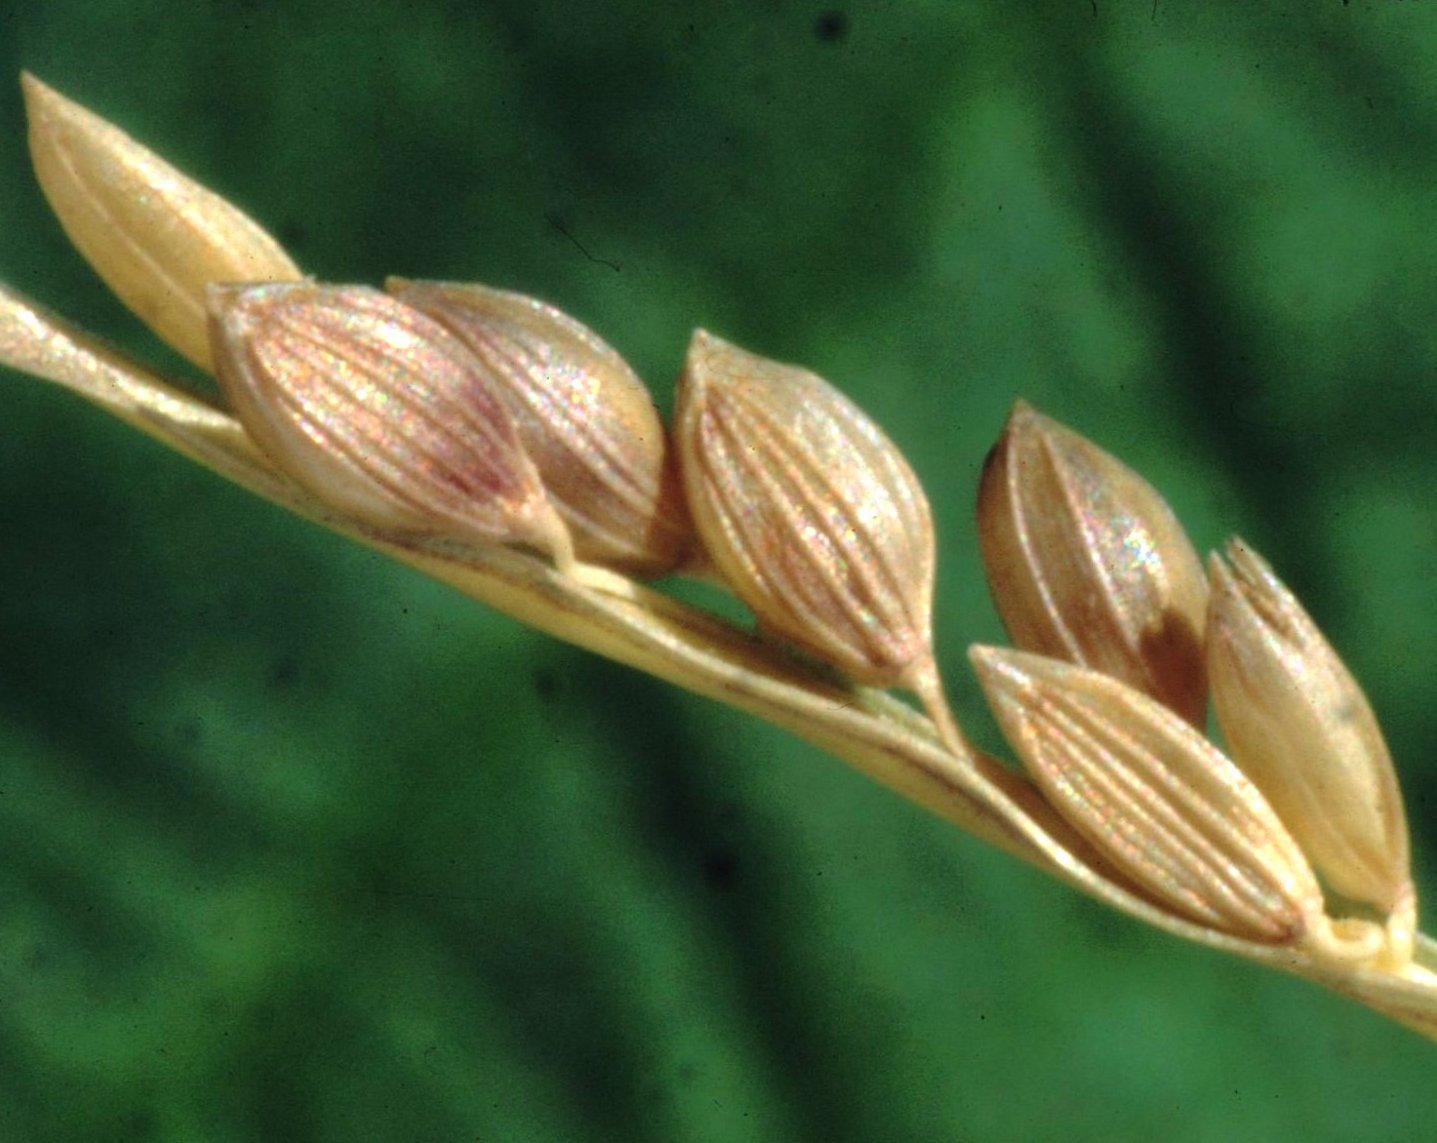 Close-up-Fonio-grains